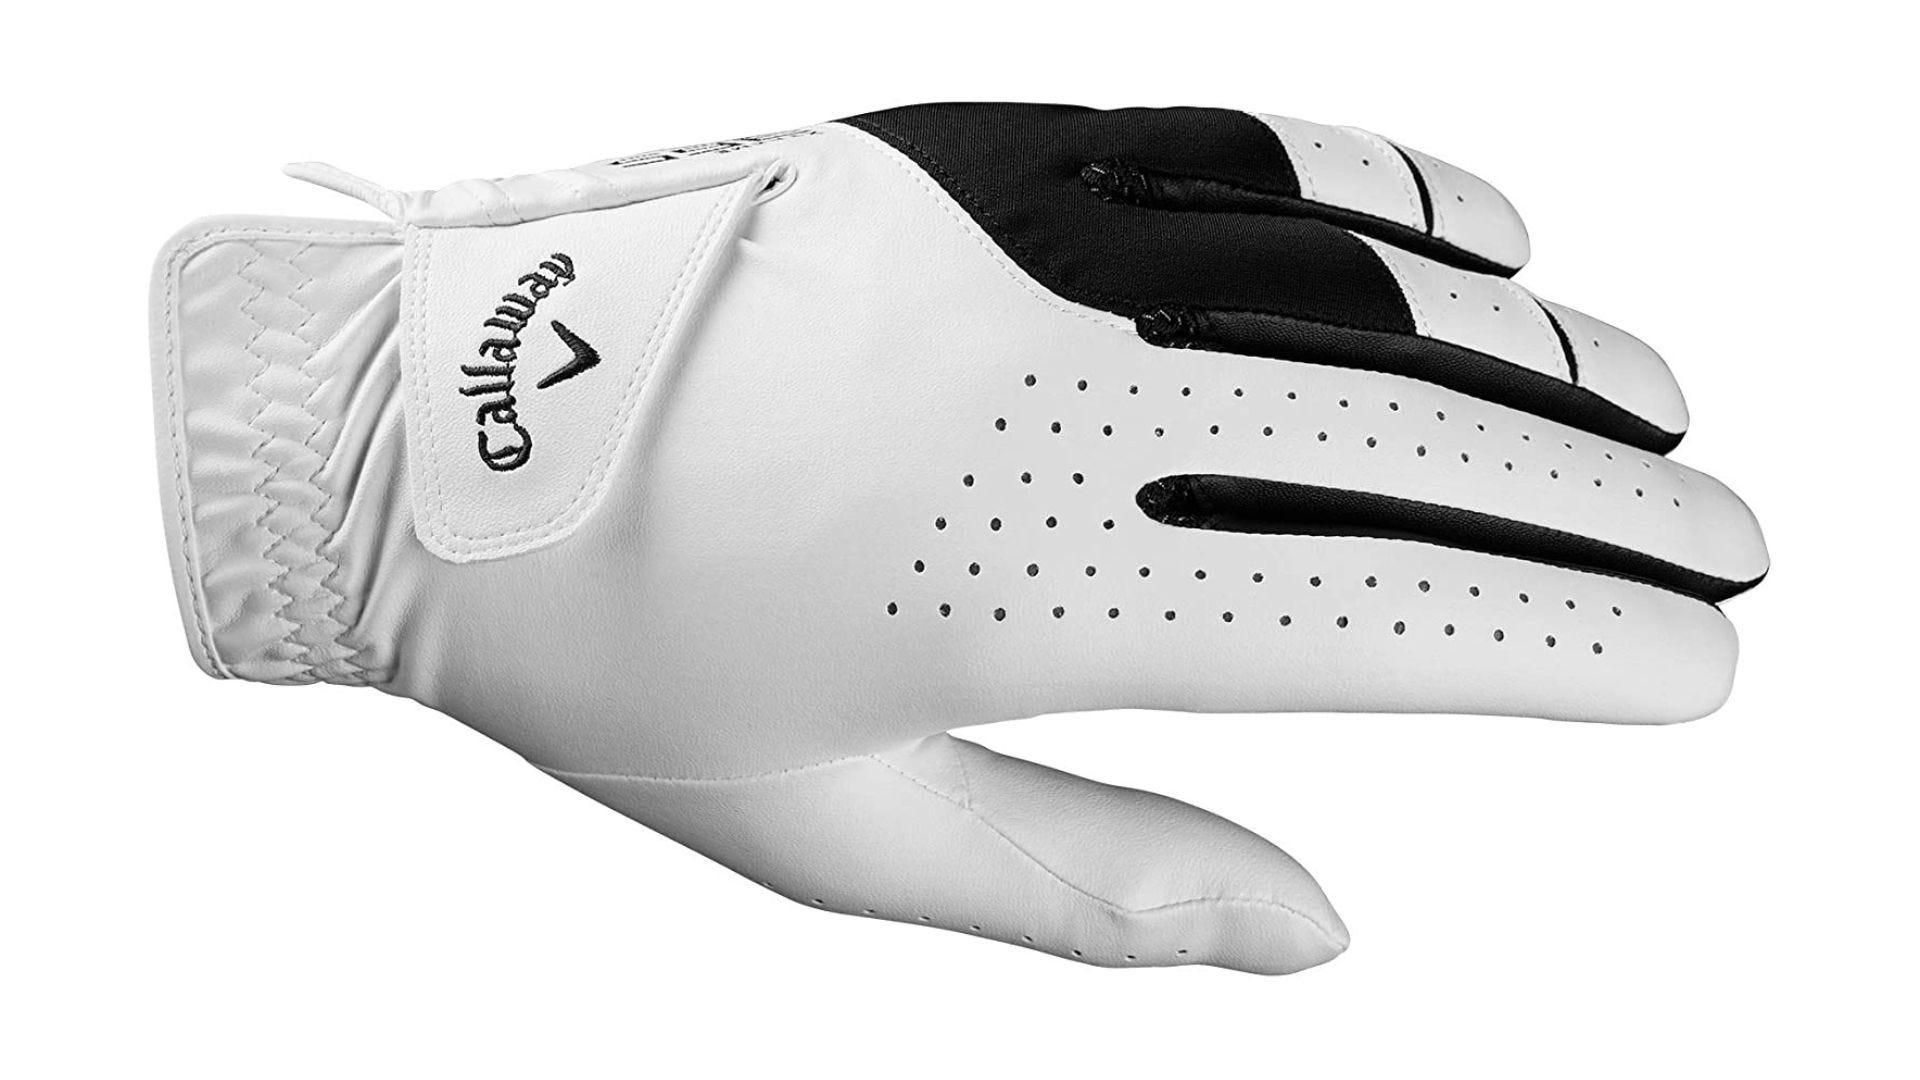 A white and black left-hand Callaway Weather Spann Premium Men's golf glove.